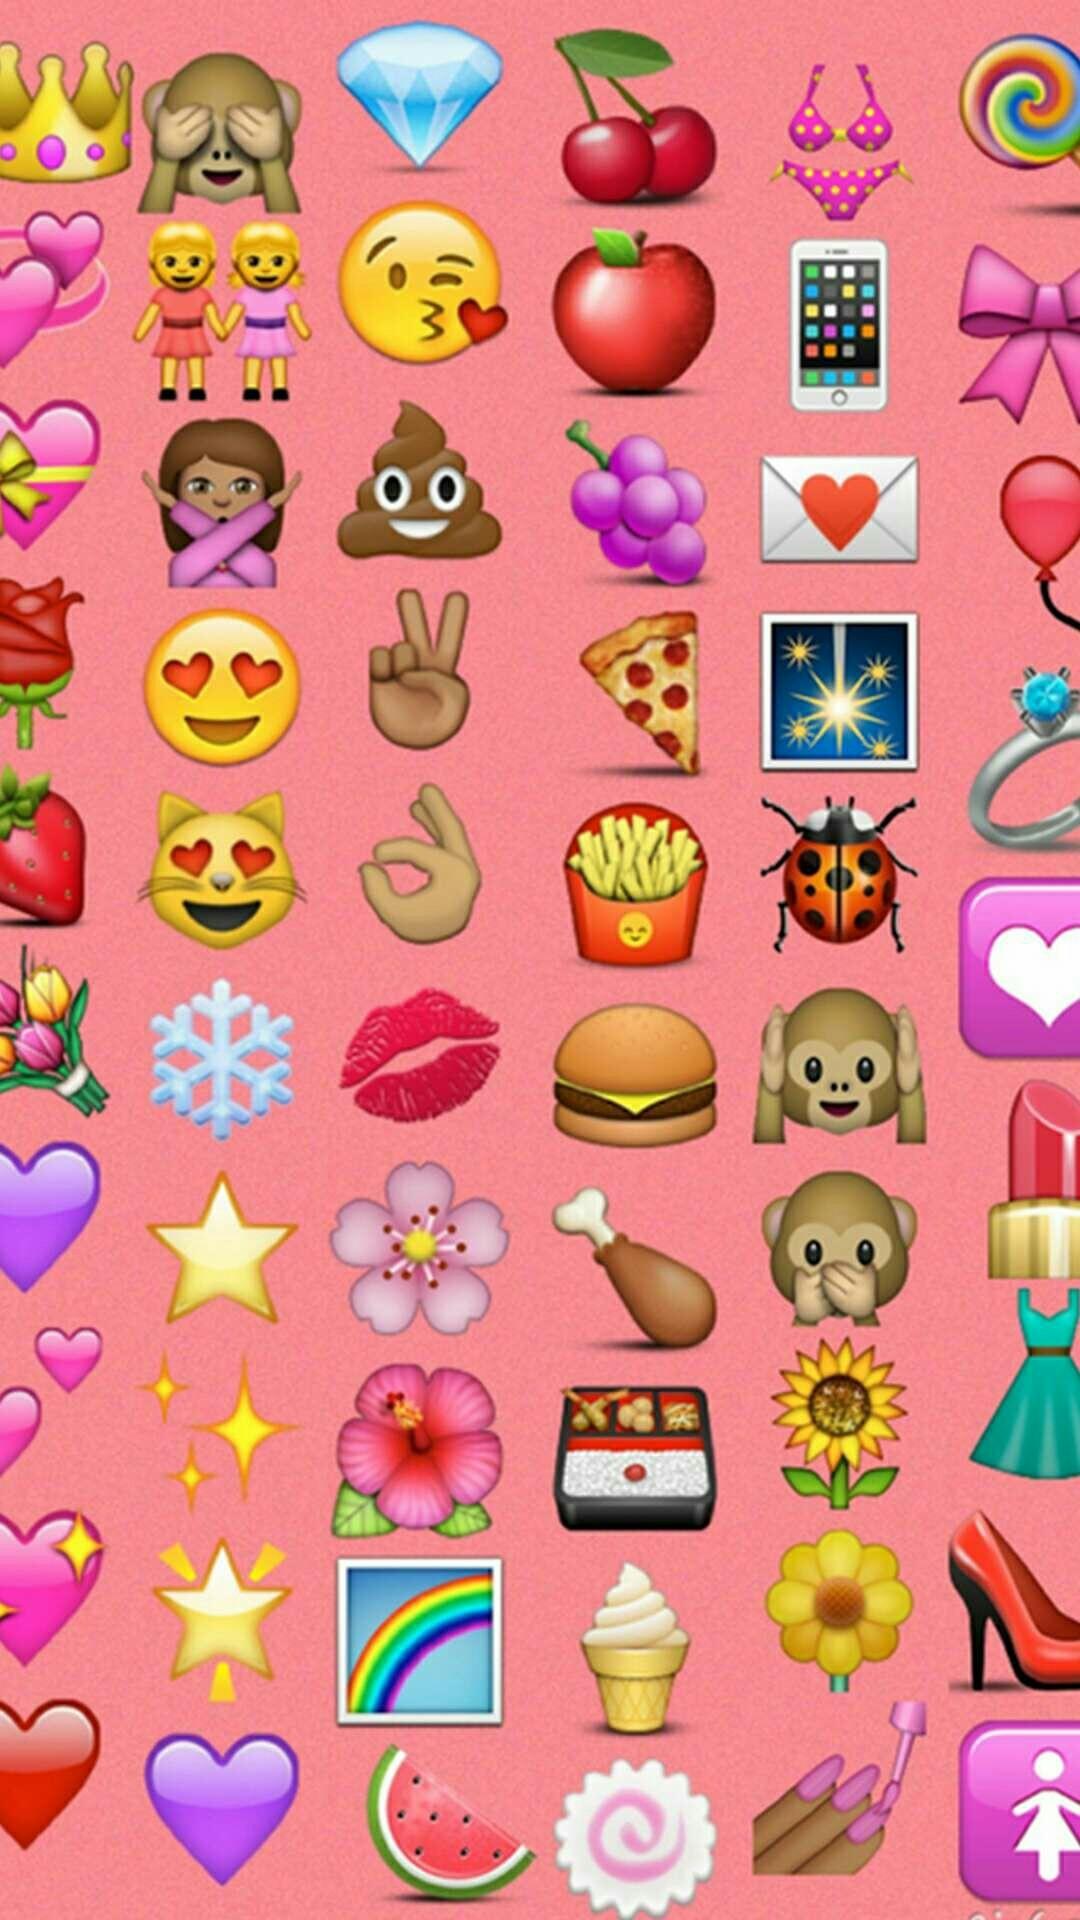 Emoji Computer Wallpaper (66+ images)